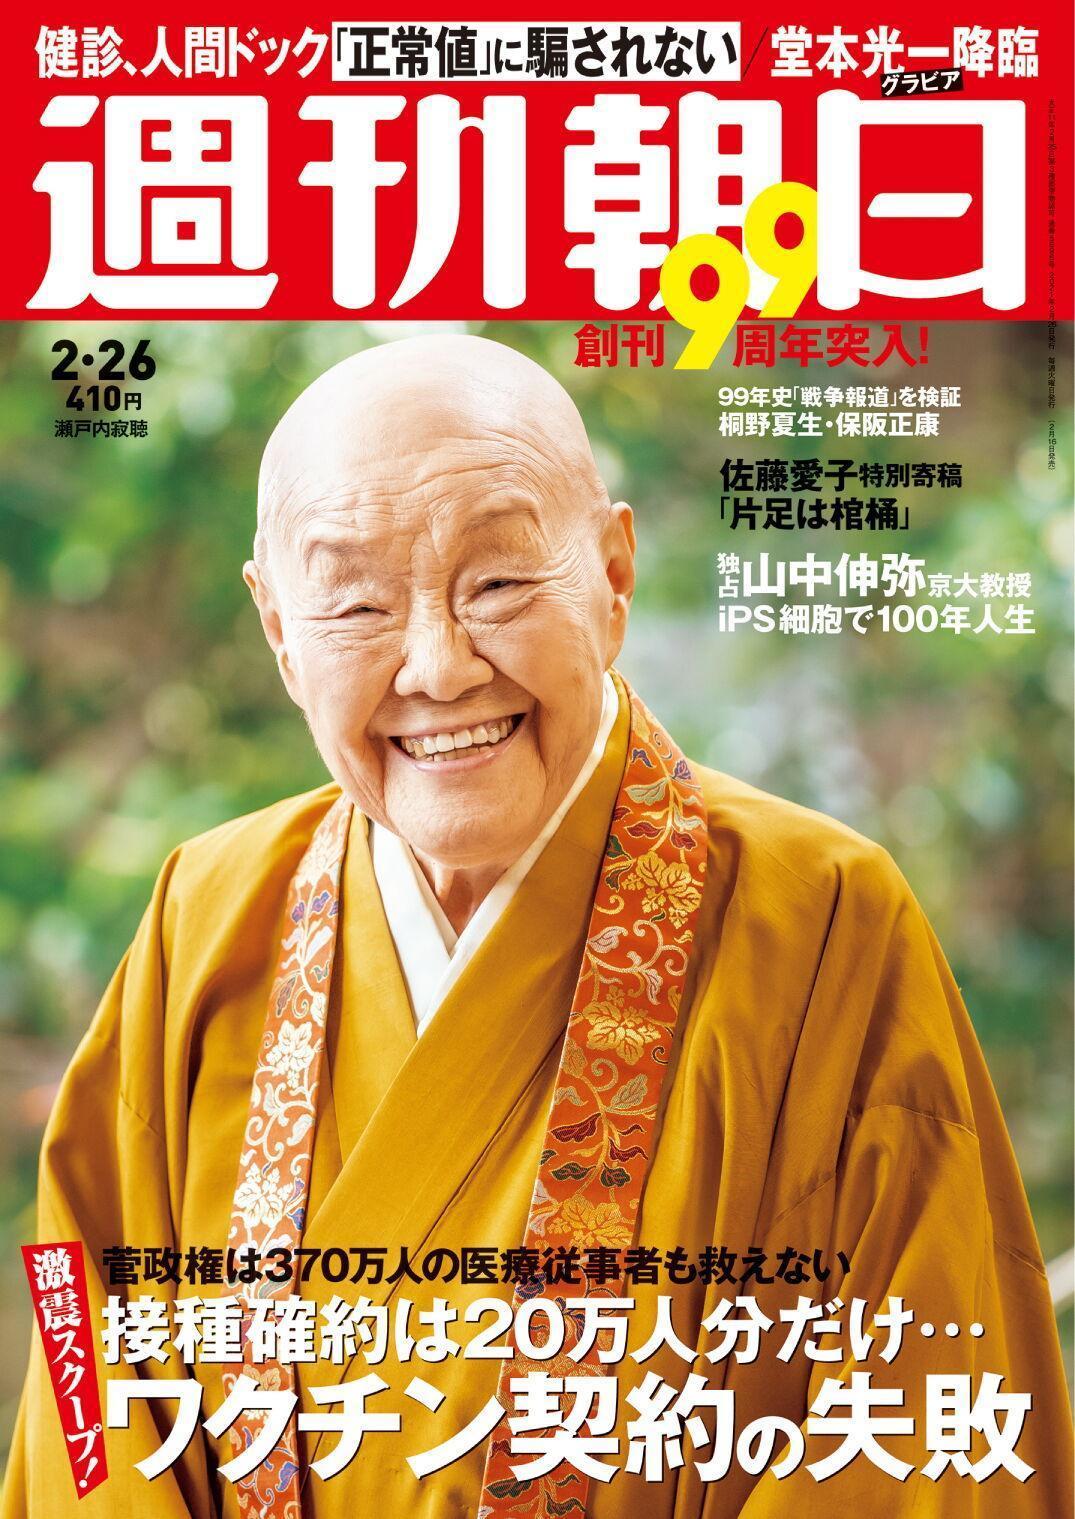 週刊朝日 Asahi – 15 2月 2021